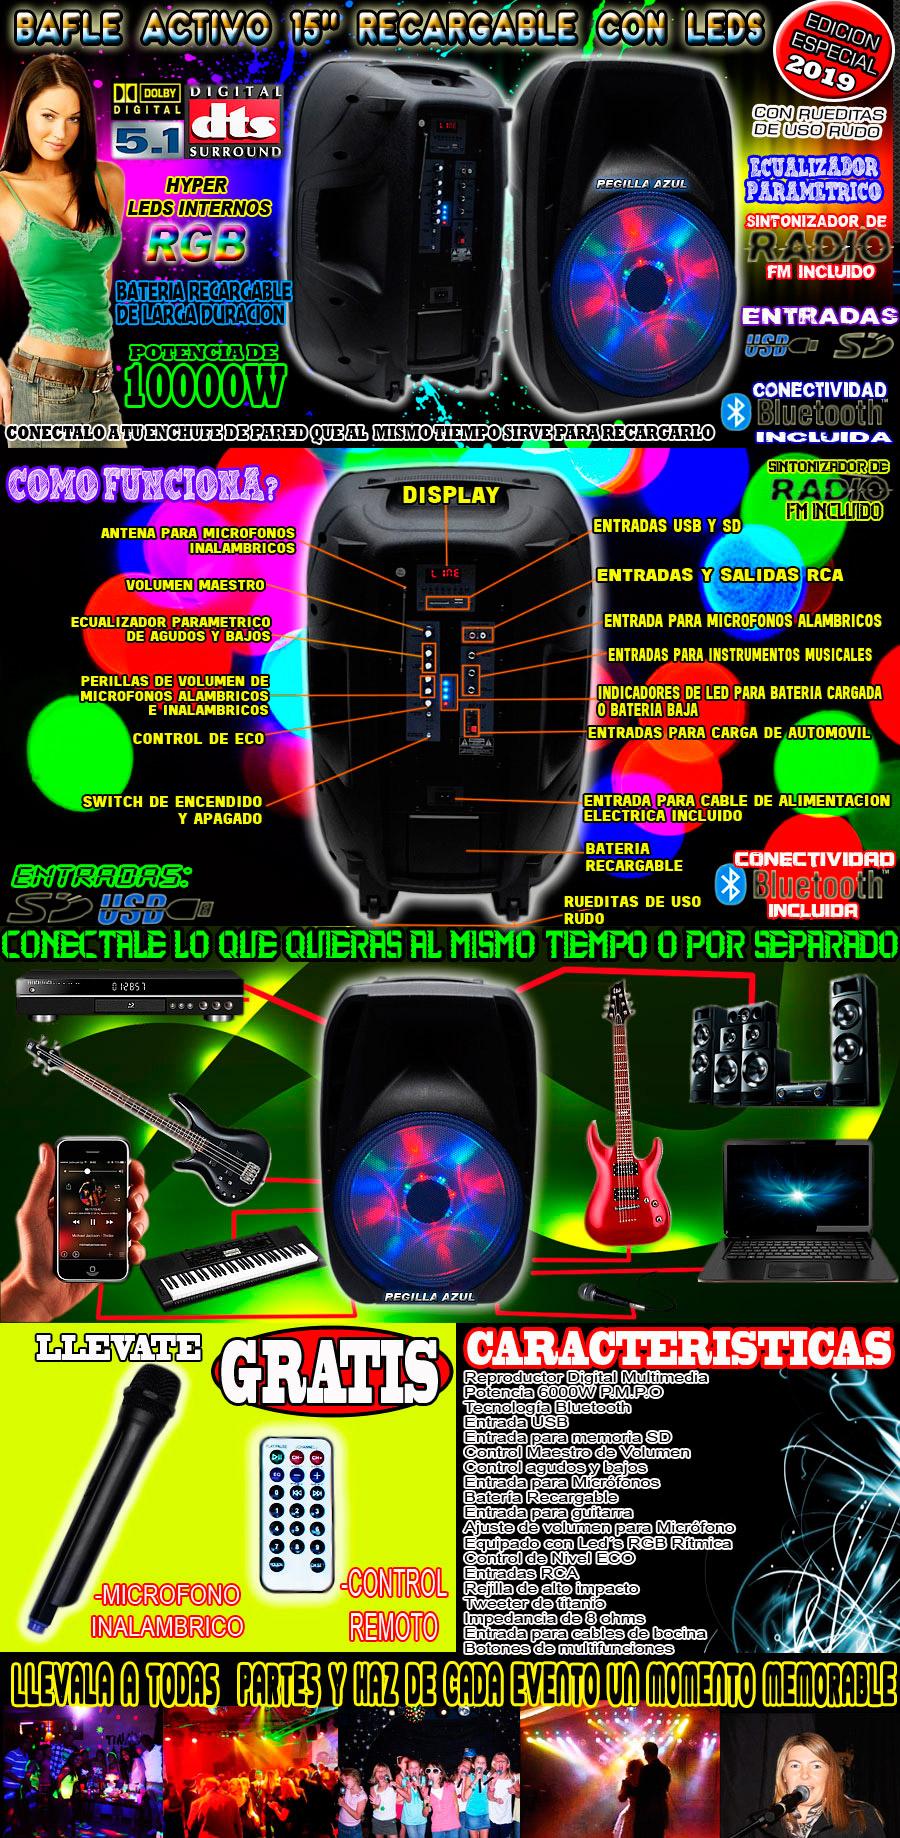 http://lomejorenvideo.com/img-van/bafle-15-leds-fussion/principal.jpg